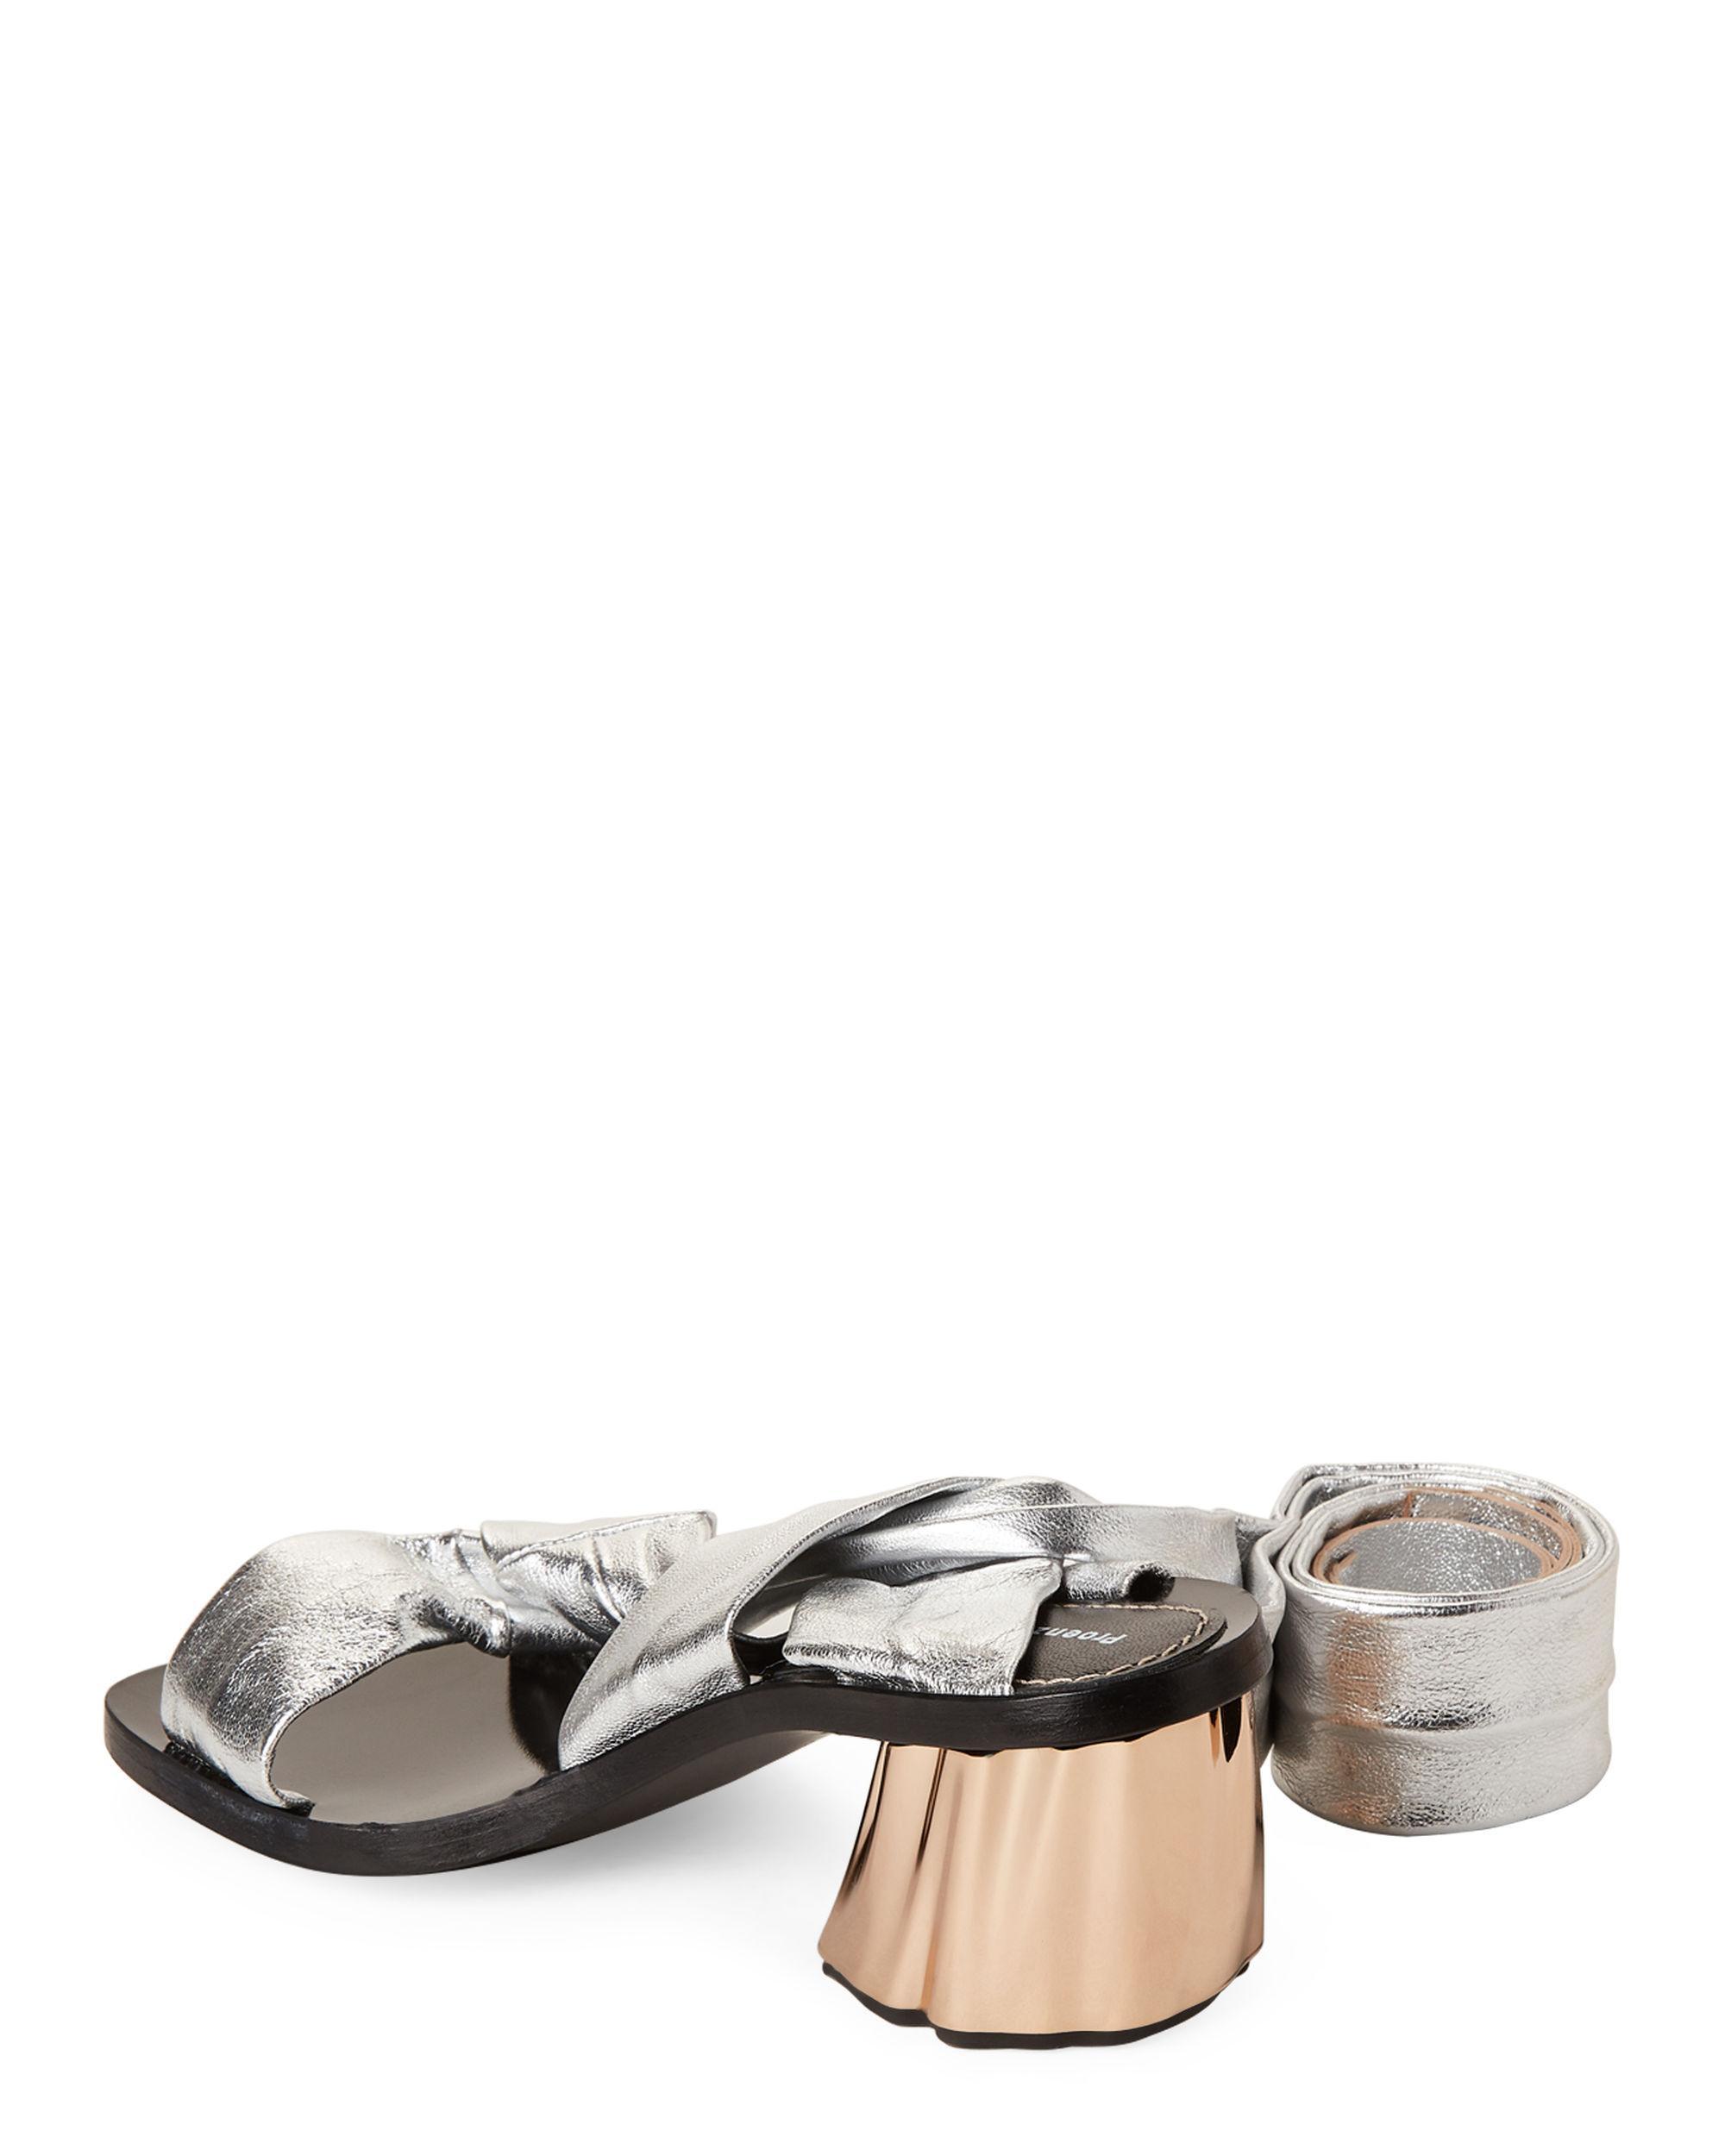 5ea437d481f Lyst - Proenza Schouler Silver Metallic Leather Ankle-wrap Sandals ...